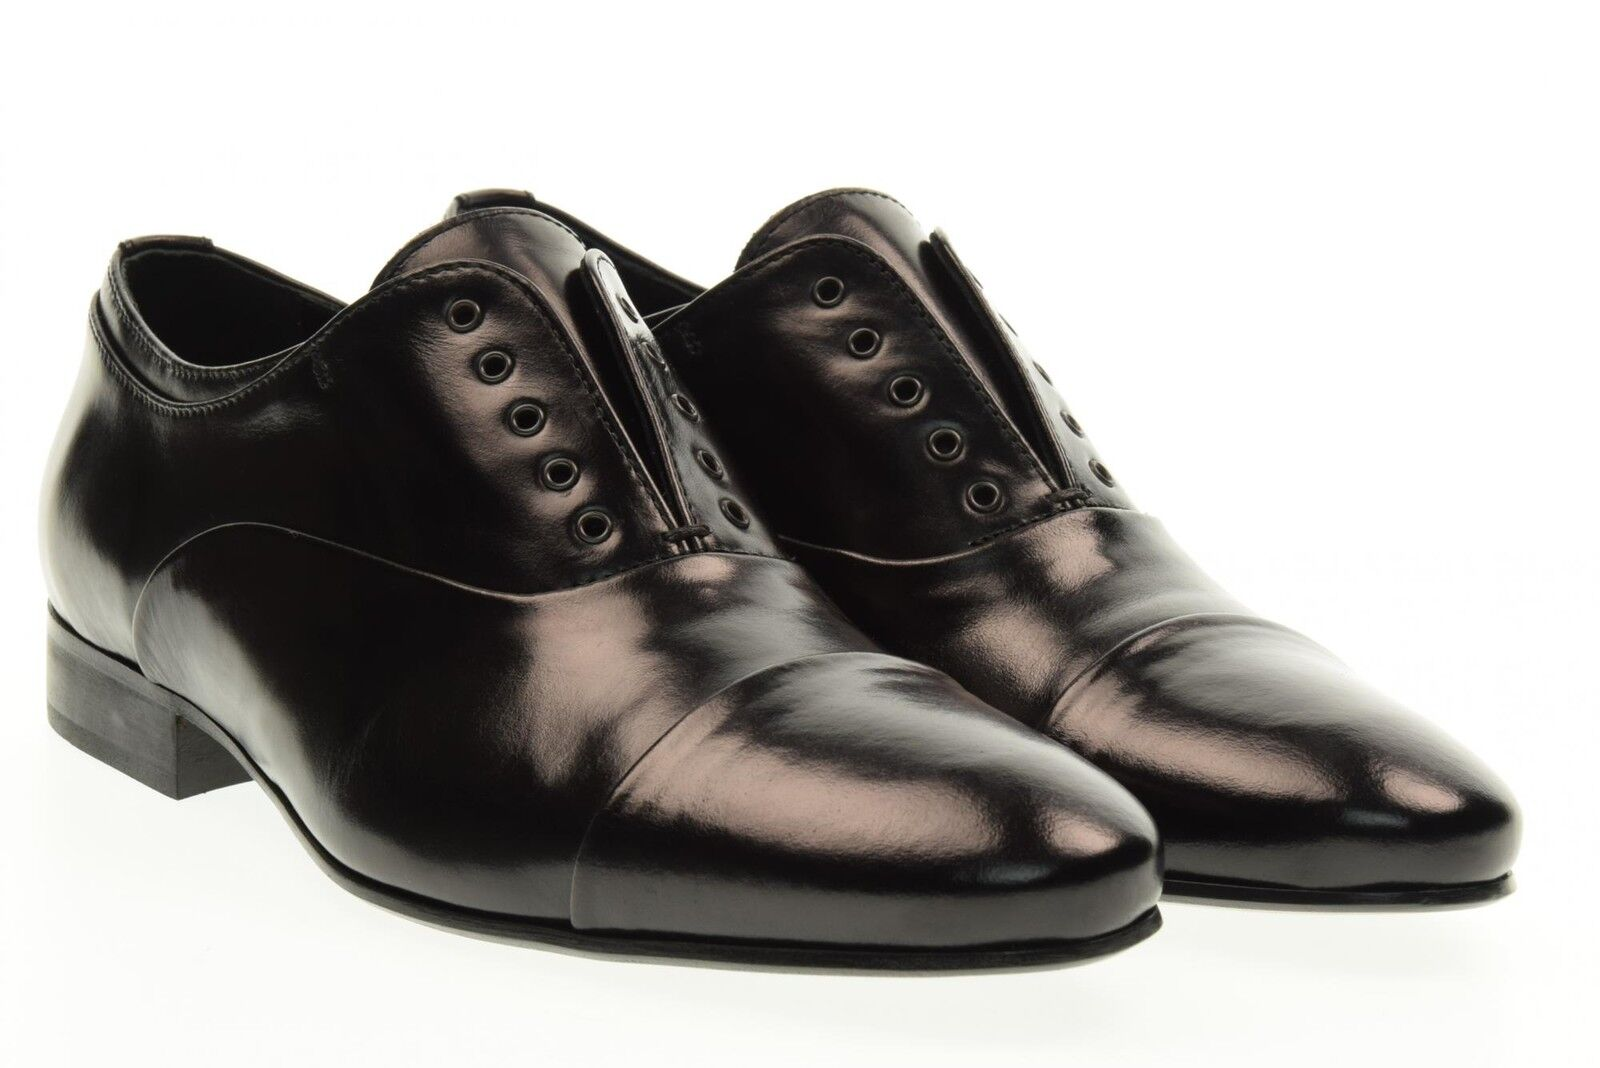 Eveet scarpe uomo senza lacci 15017 P17